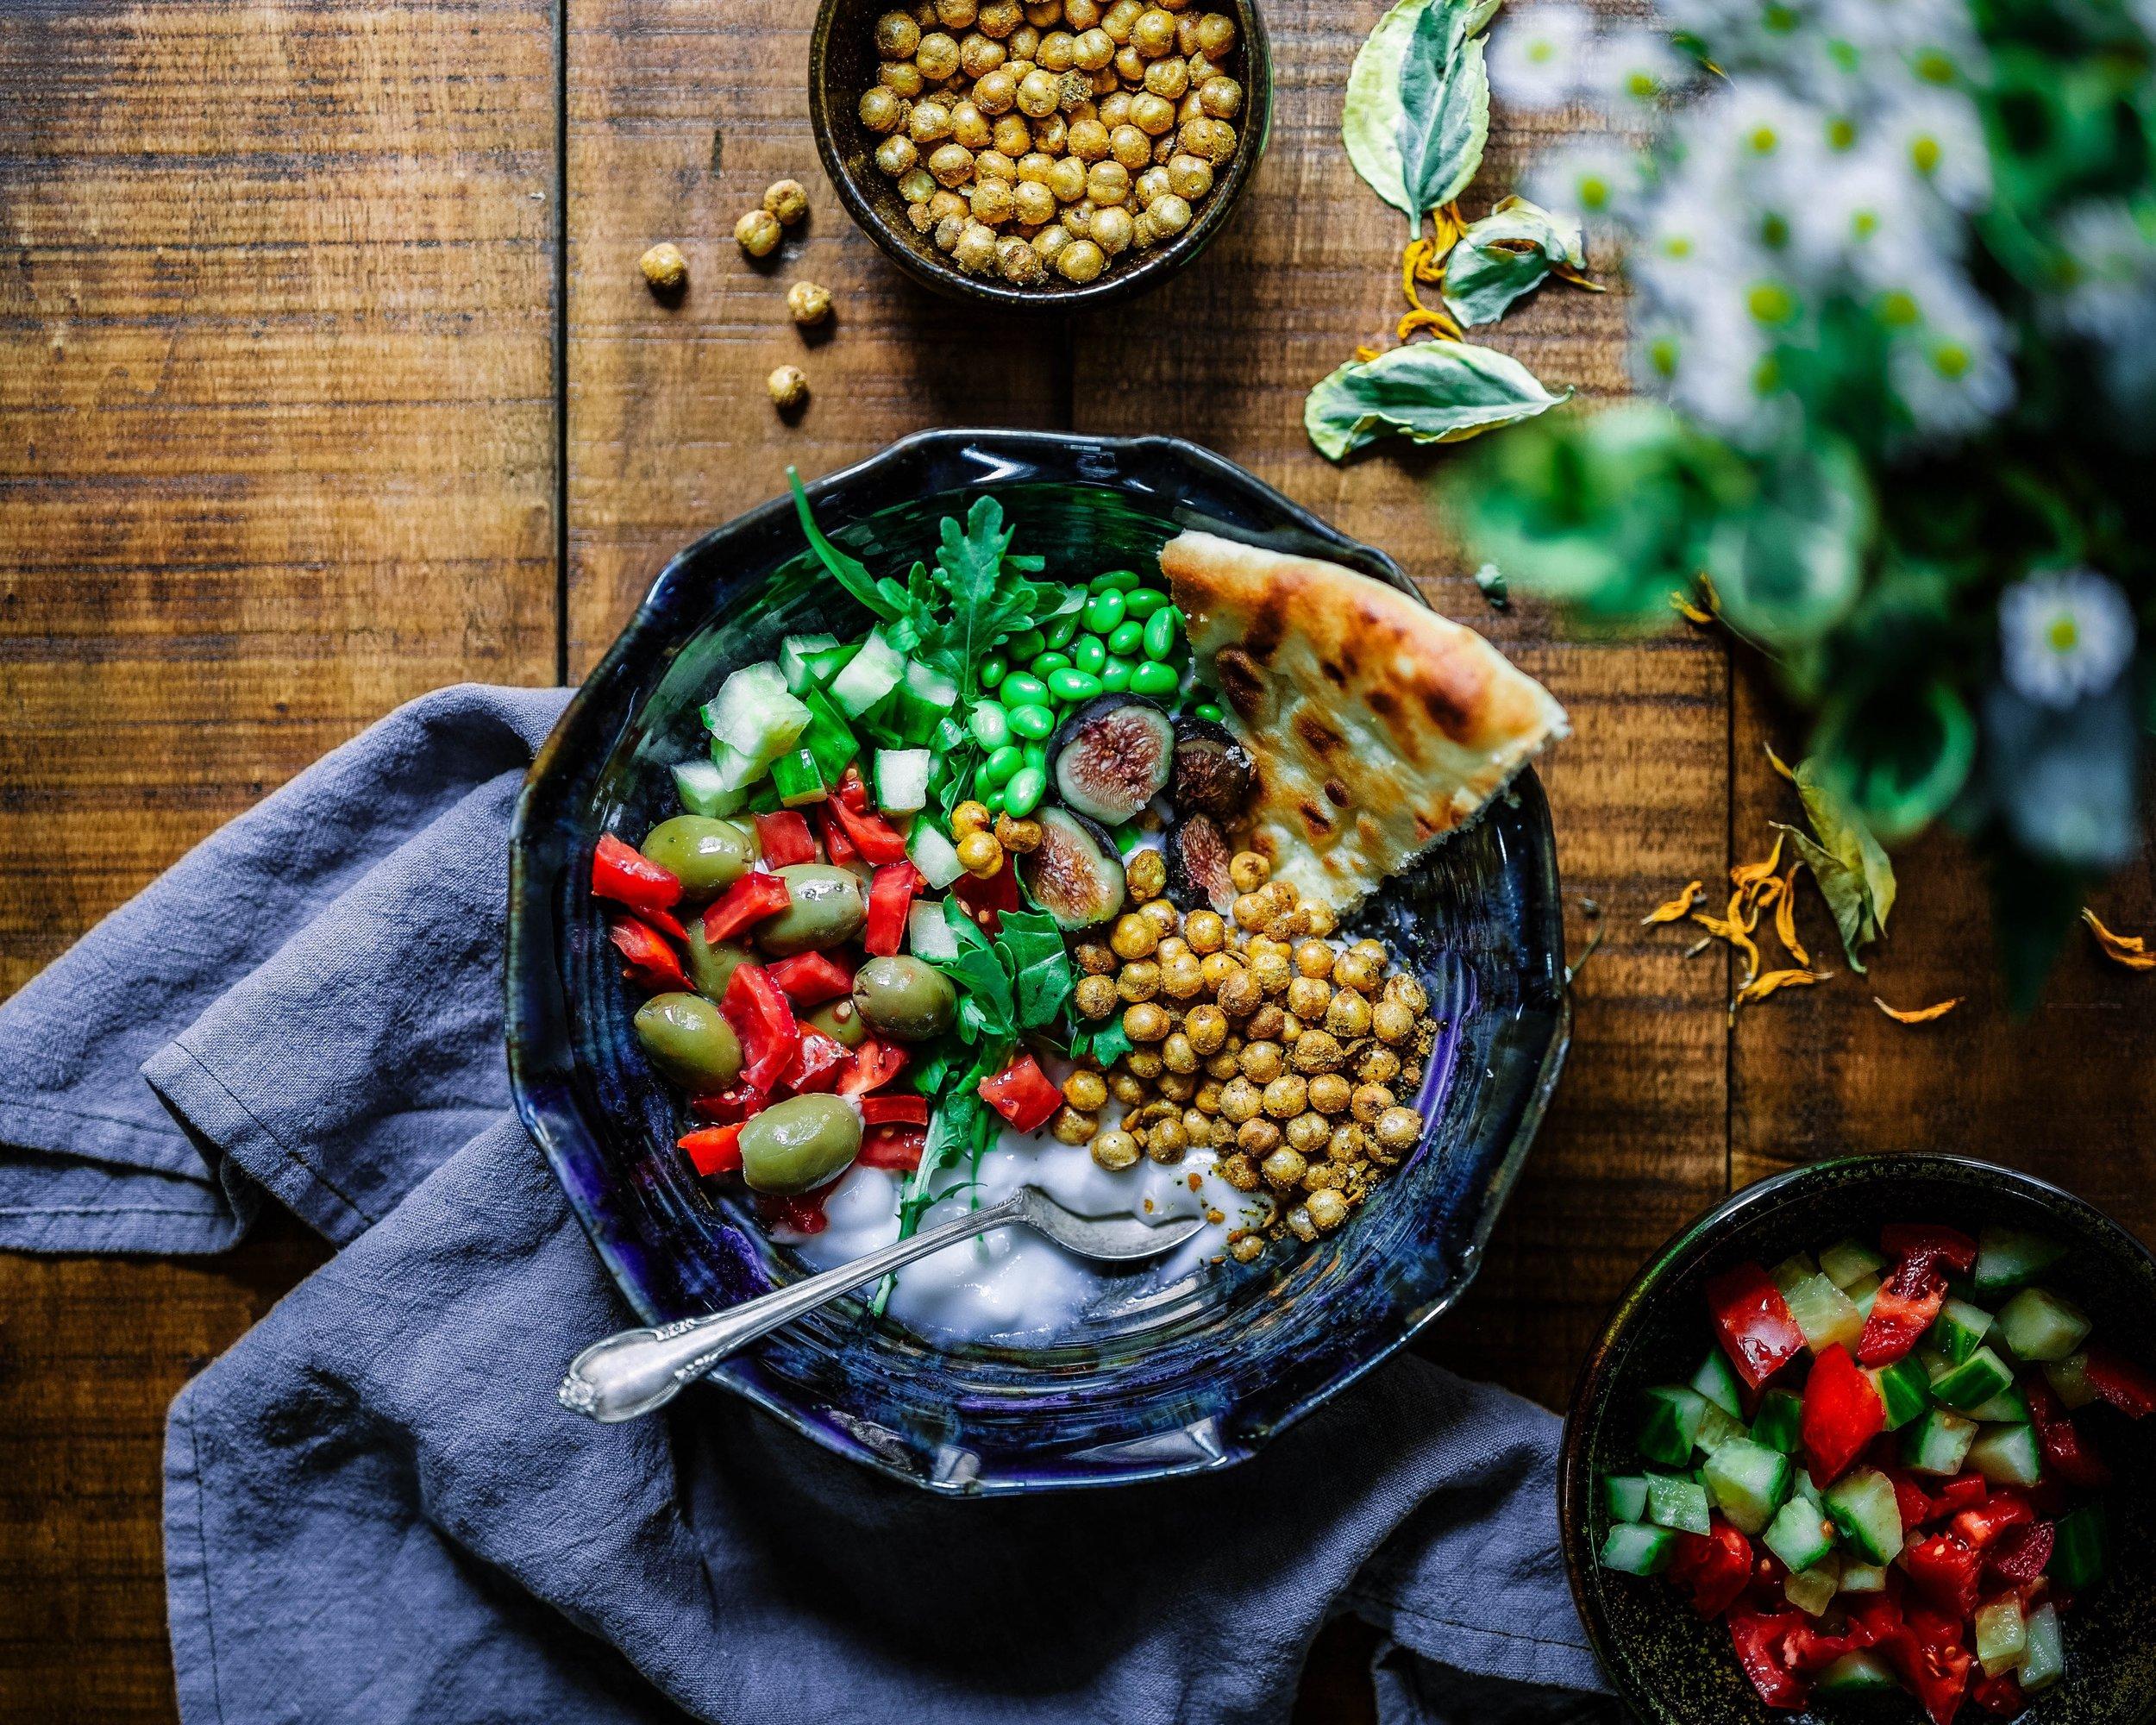 culinary creativity